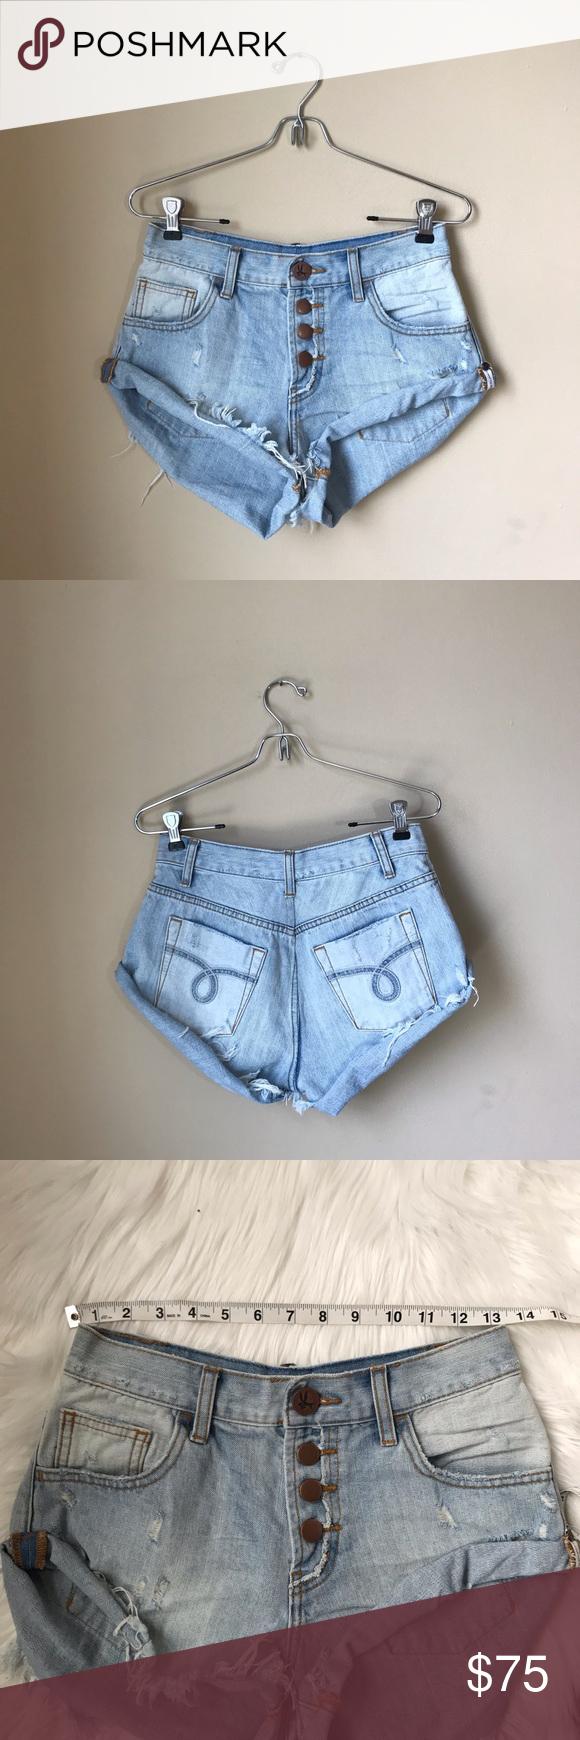 One X One Teaspoon Button Fly Bandits Denim Shorts Fashion Clothes Design Fashion Trends